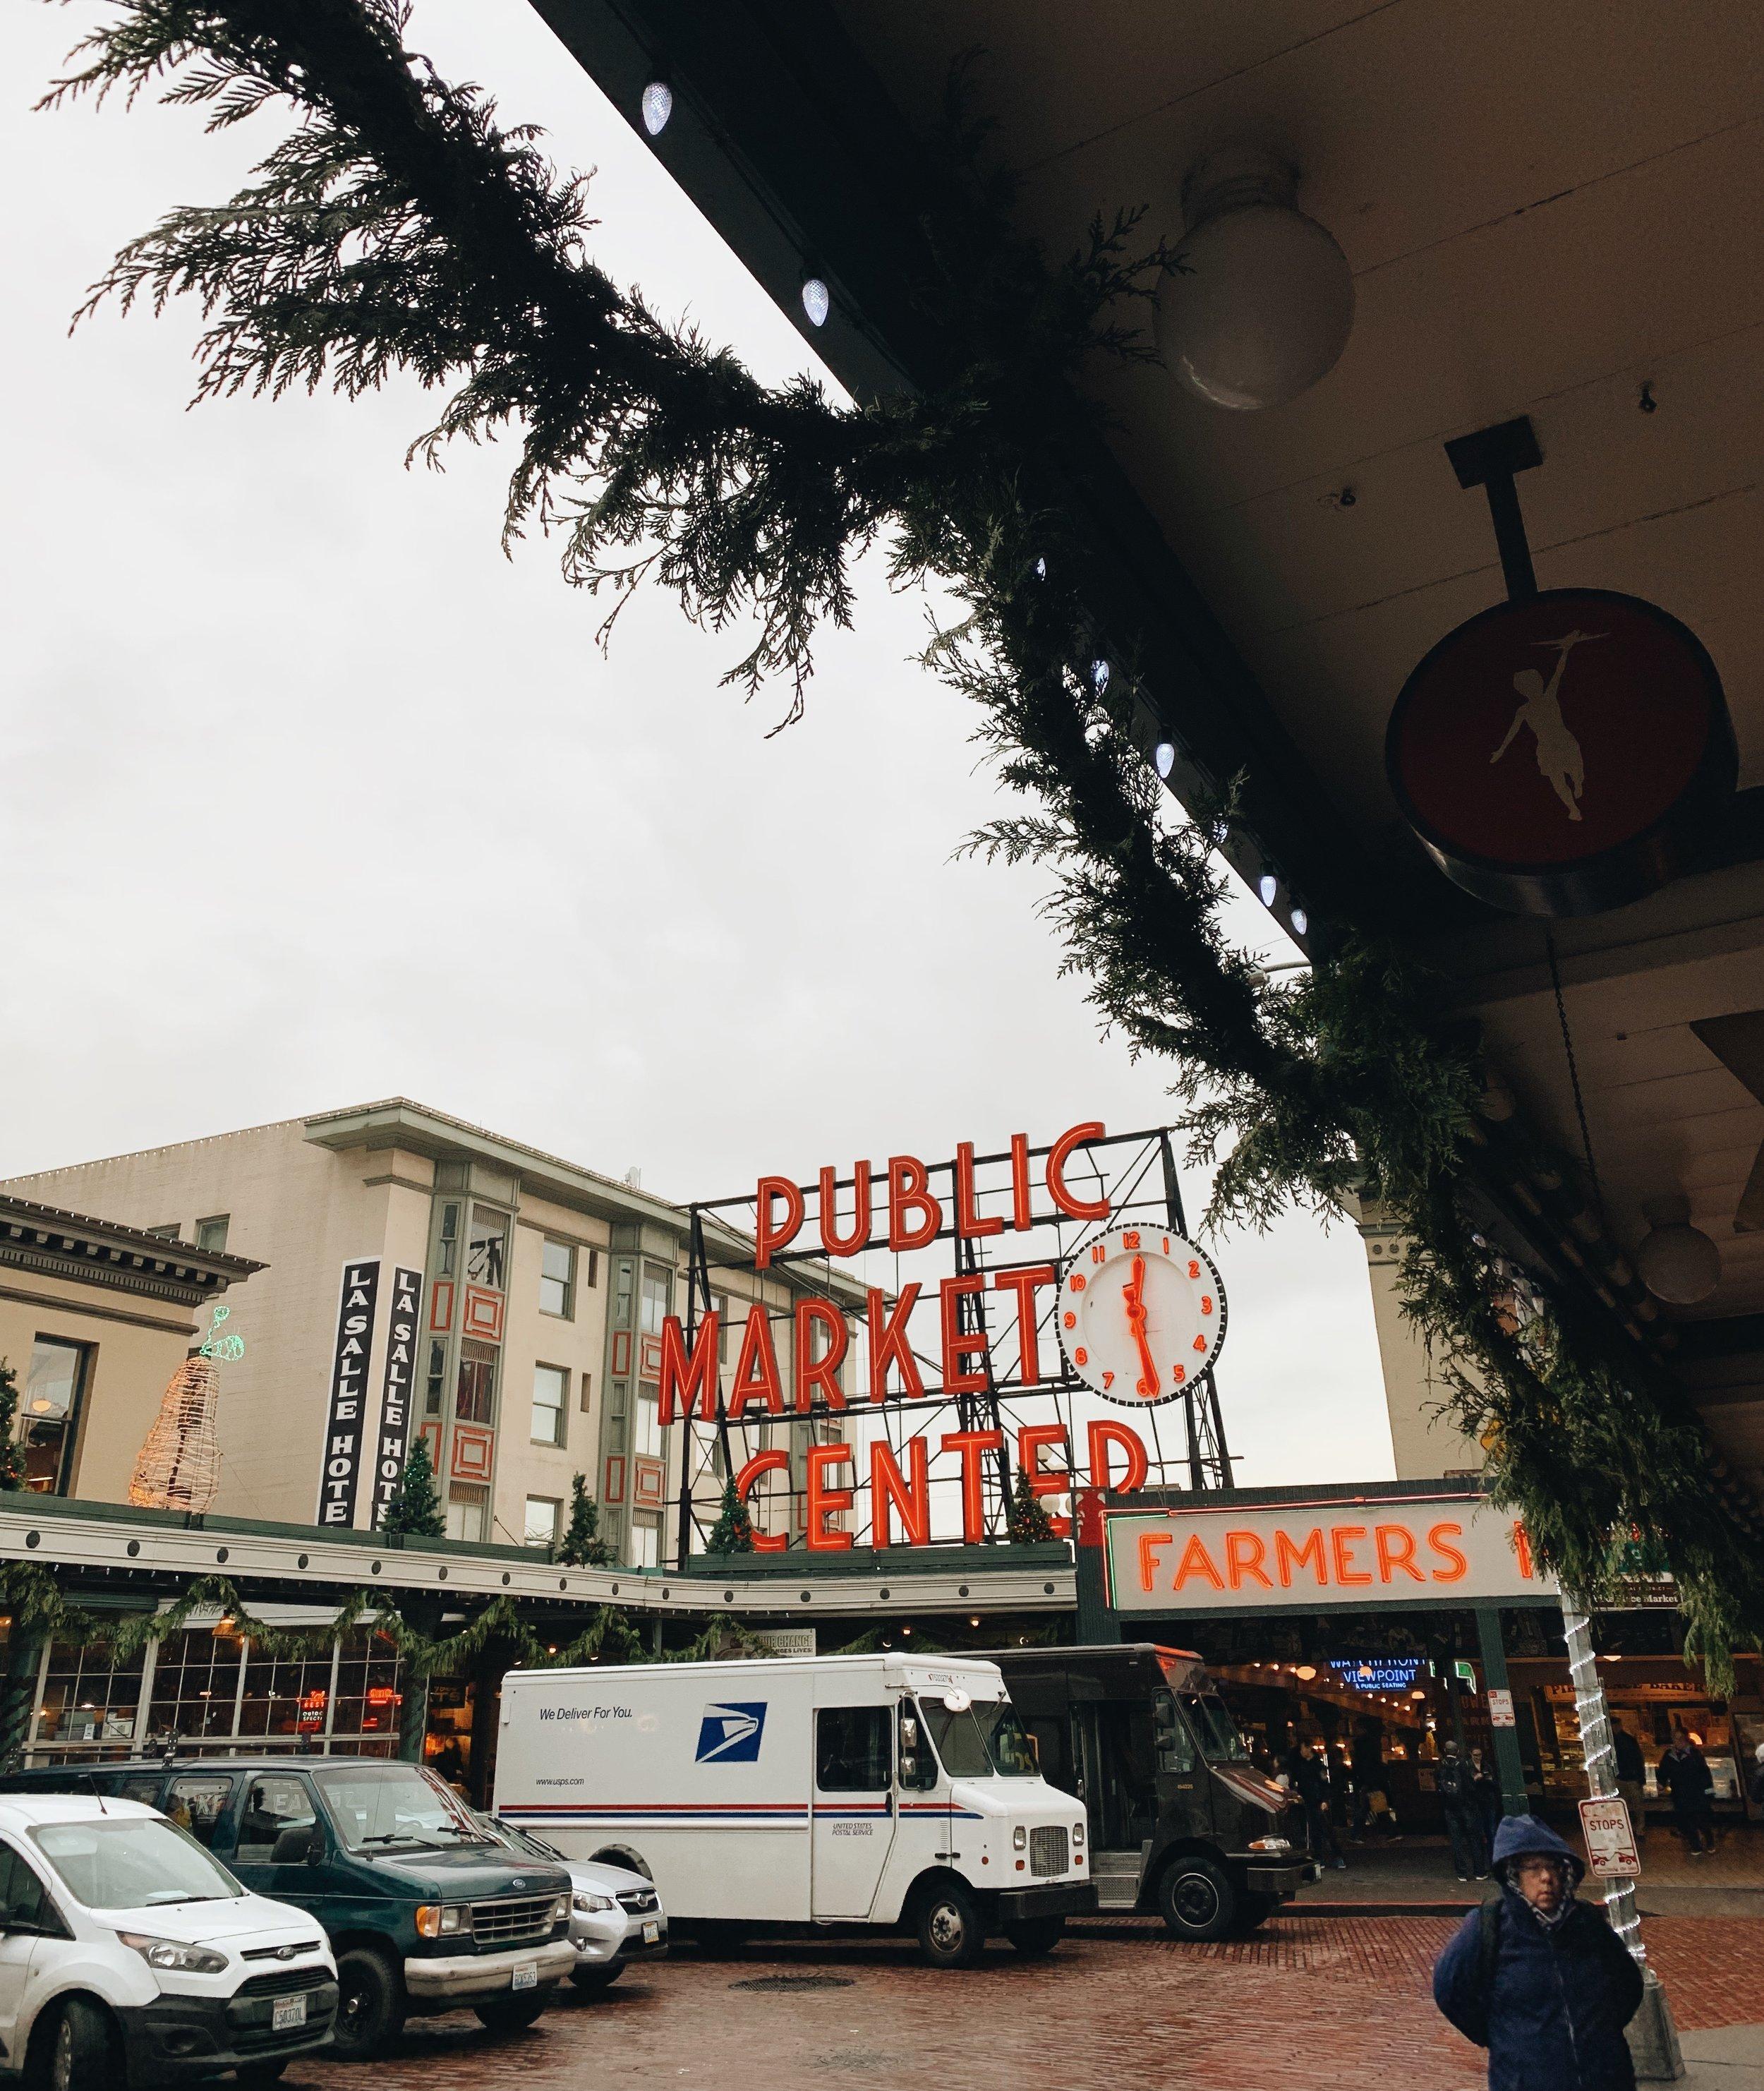 Pike Place Maket